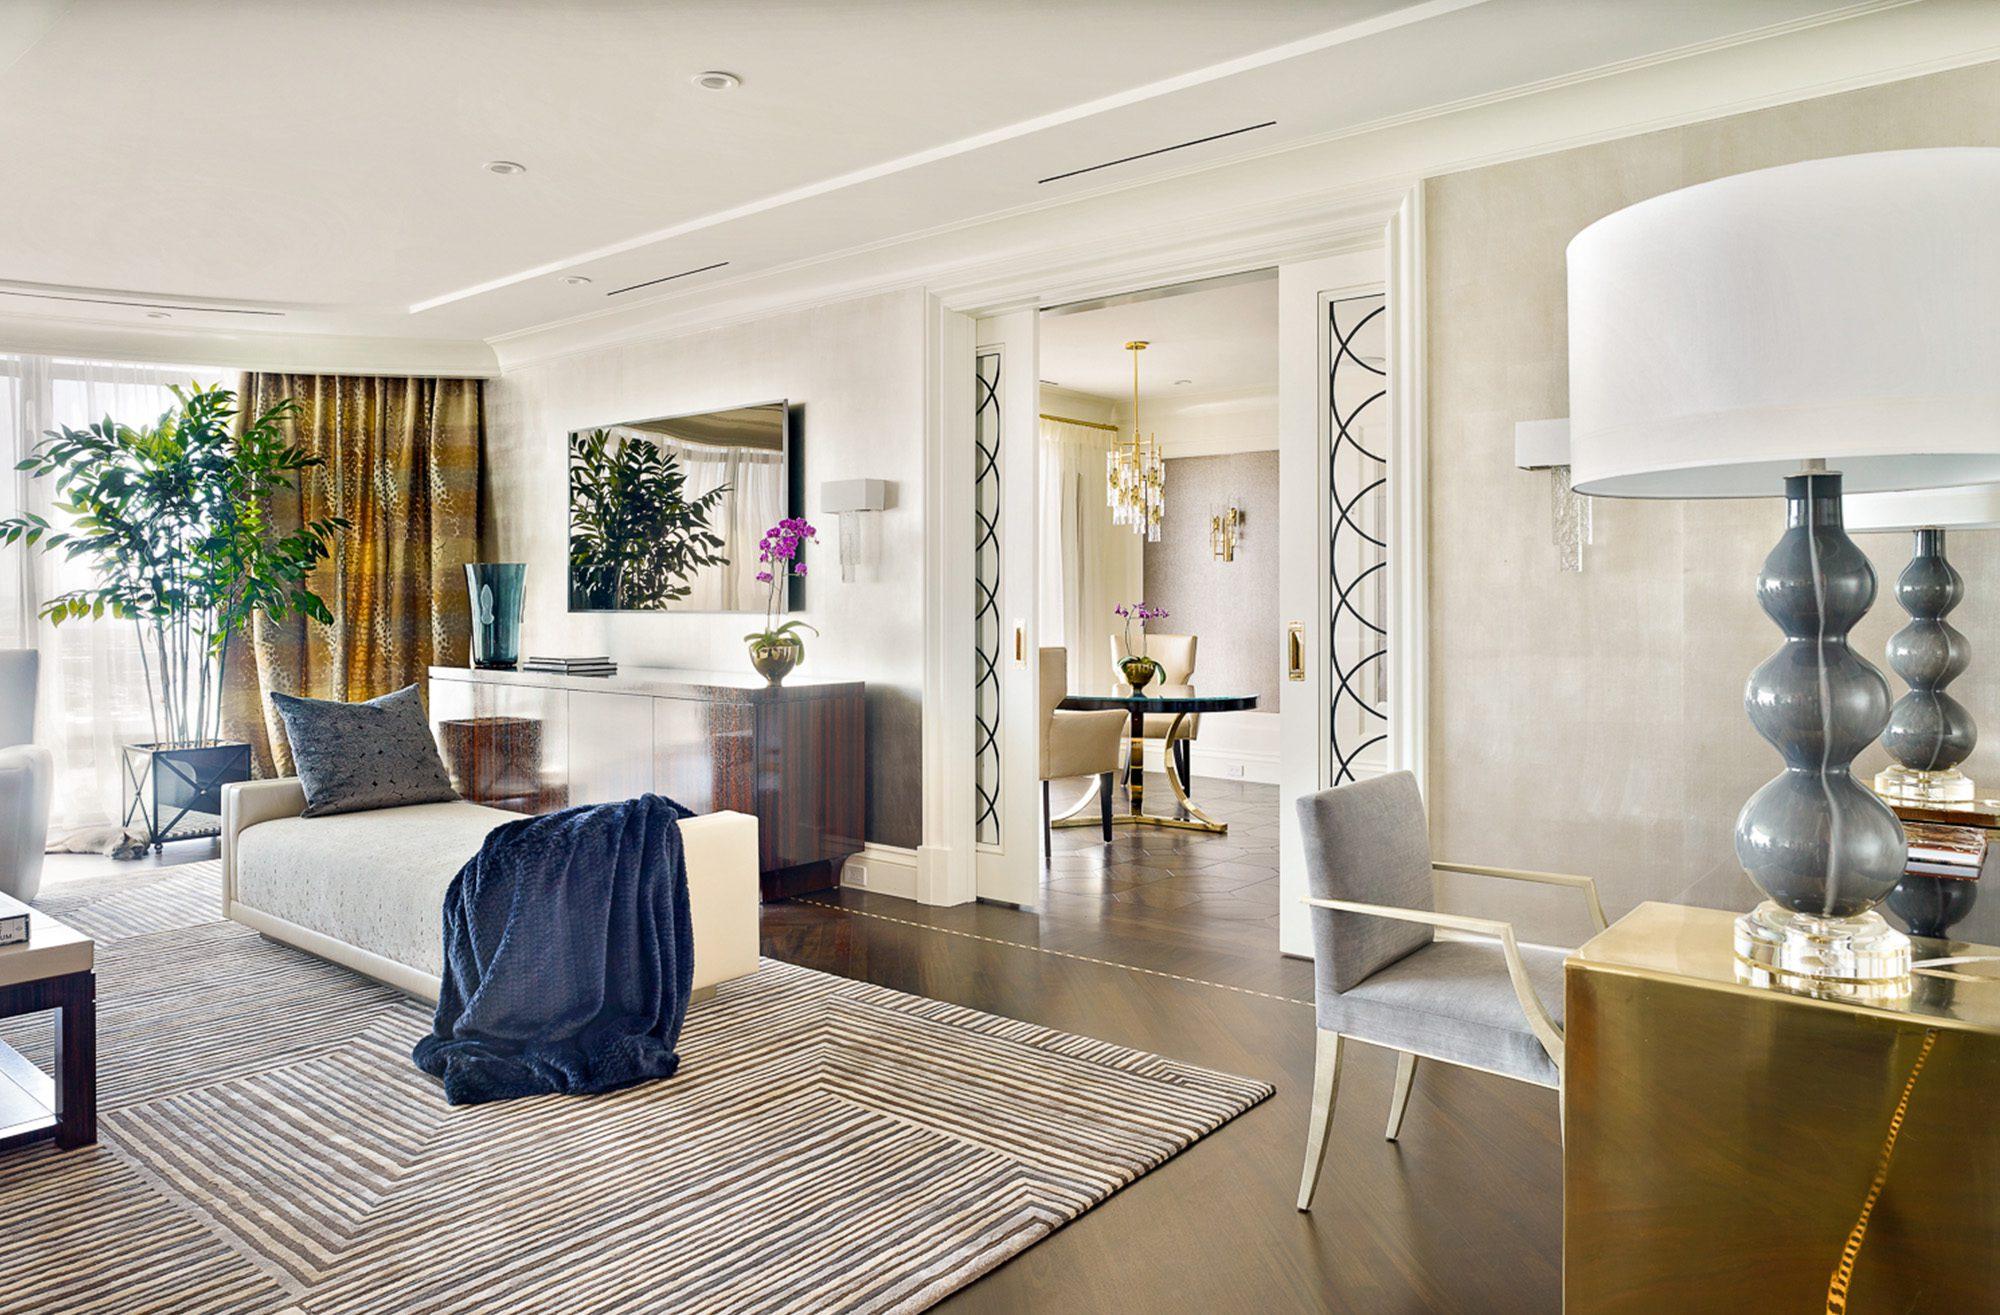 01-tara-dudley-interiors-modern-glam-penthouse-003-copy